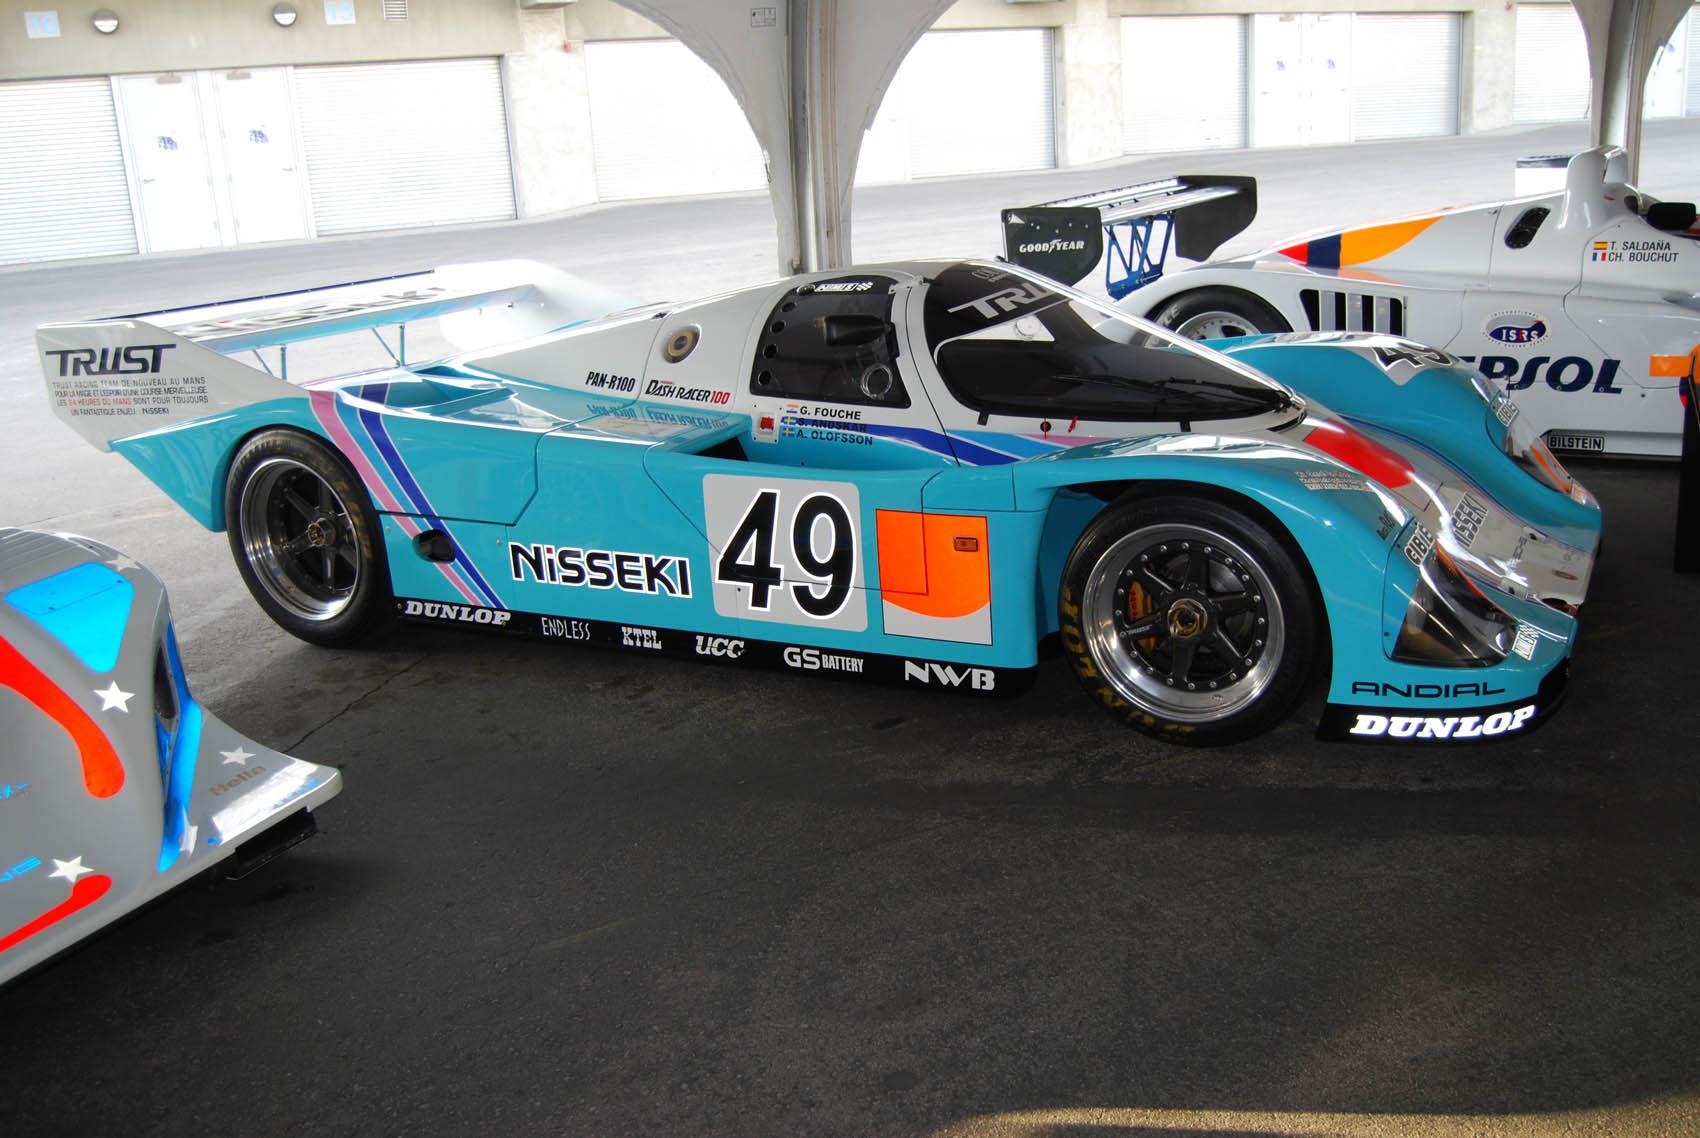 962c Trust Nisseki 49 Le Mans 1991 Racedepartment